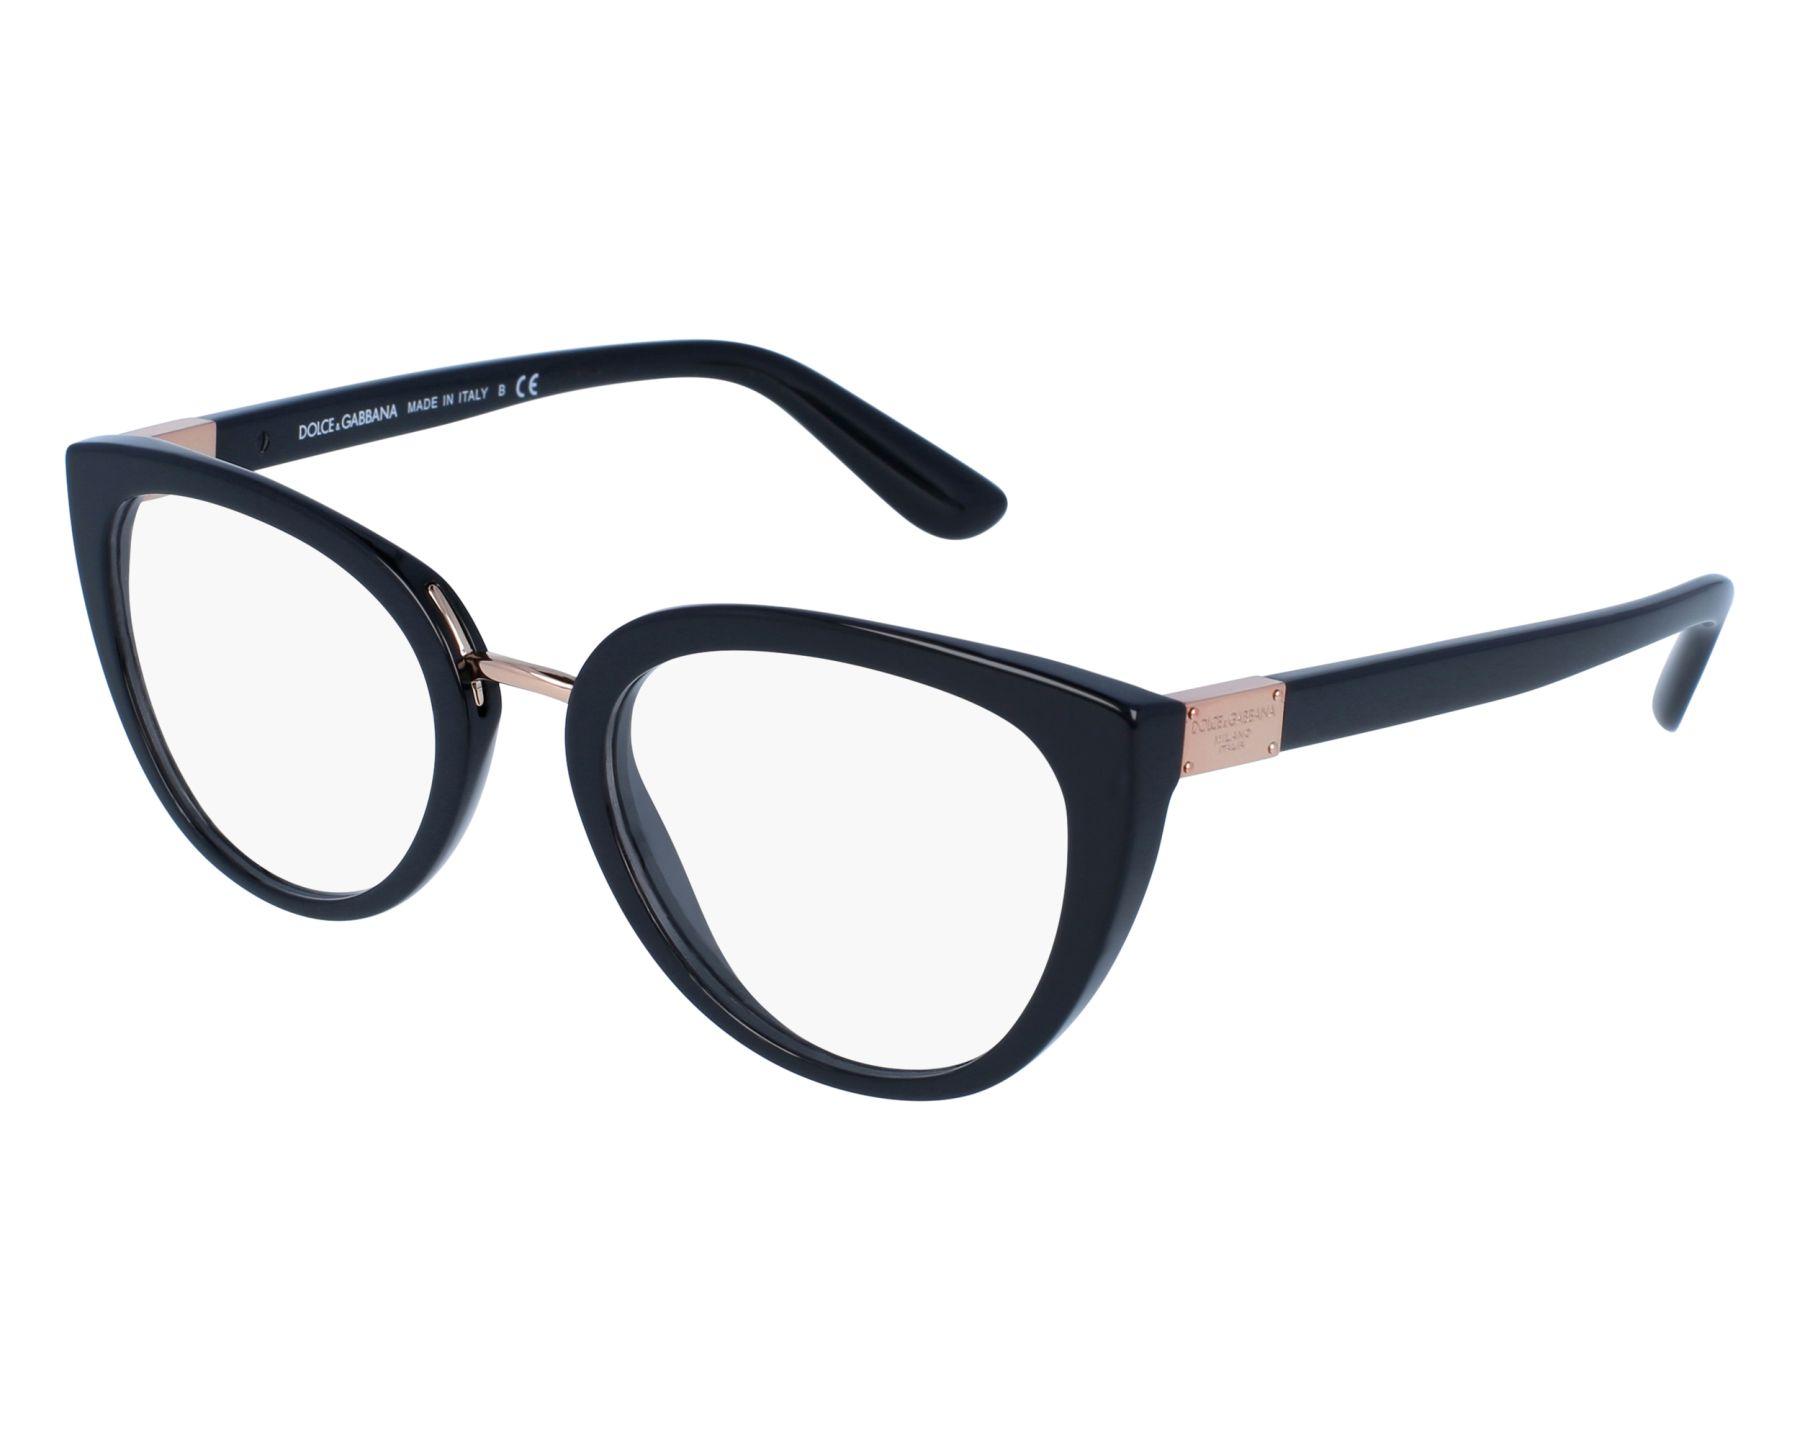 Dolce Gabbana Prescription Glasses